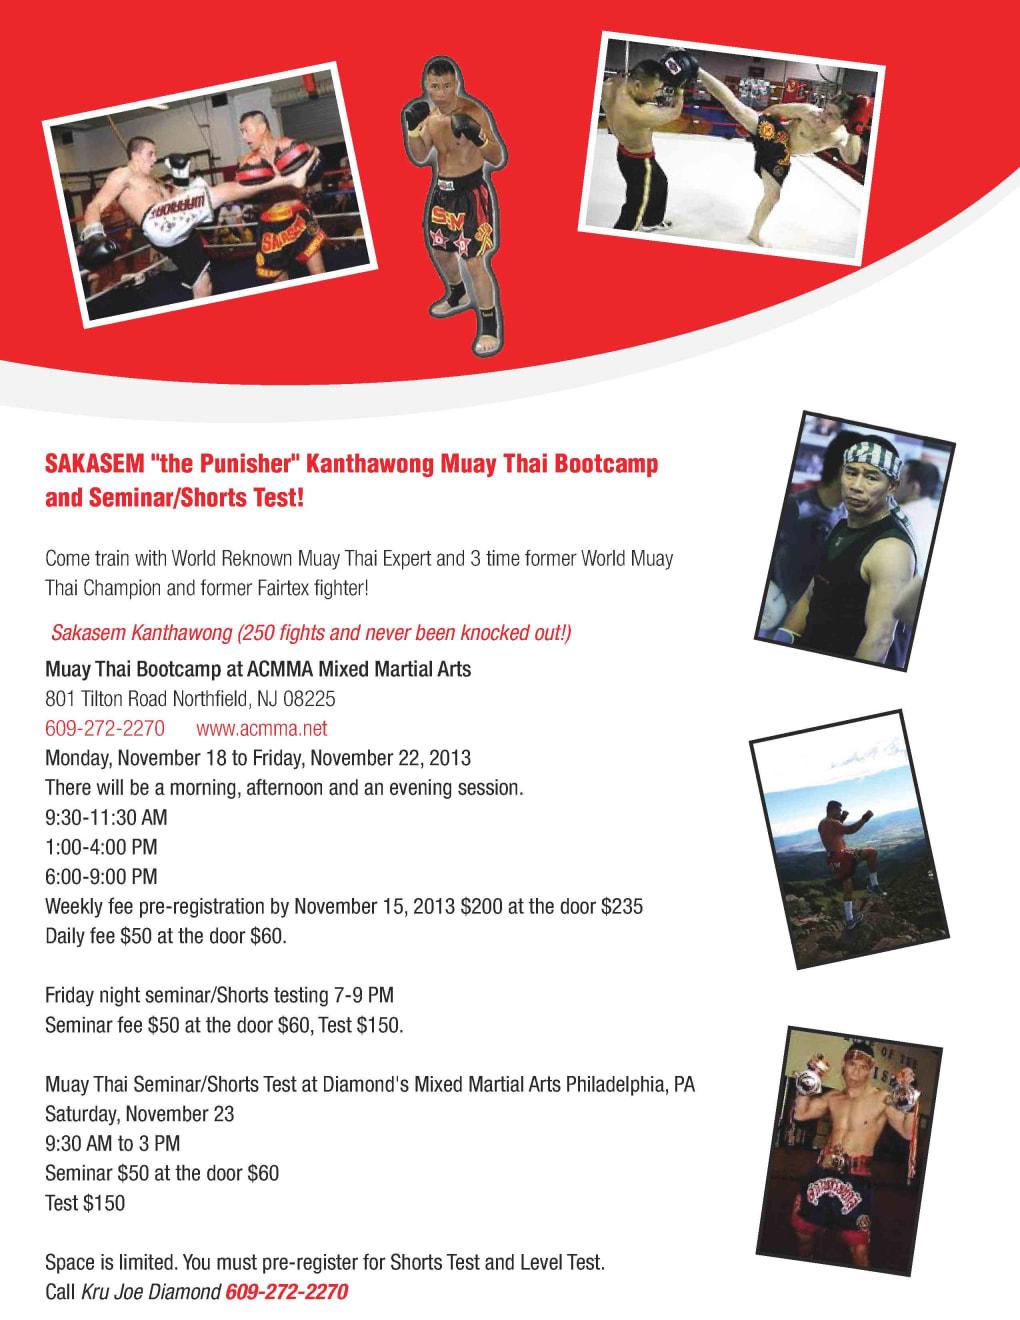 Kids Martial Arts in Philadelphia - Commando Krav Maga and Diamond Mixed Martial Arts - SAKASEM  Kanthawong Muay Thai Bootcamp